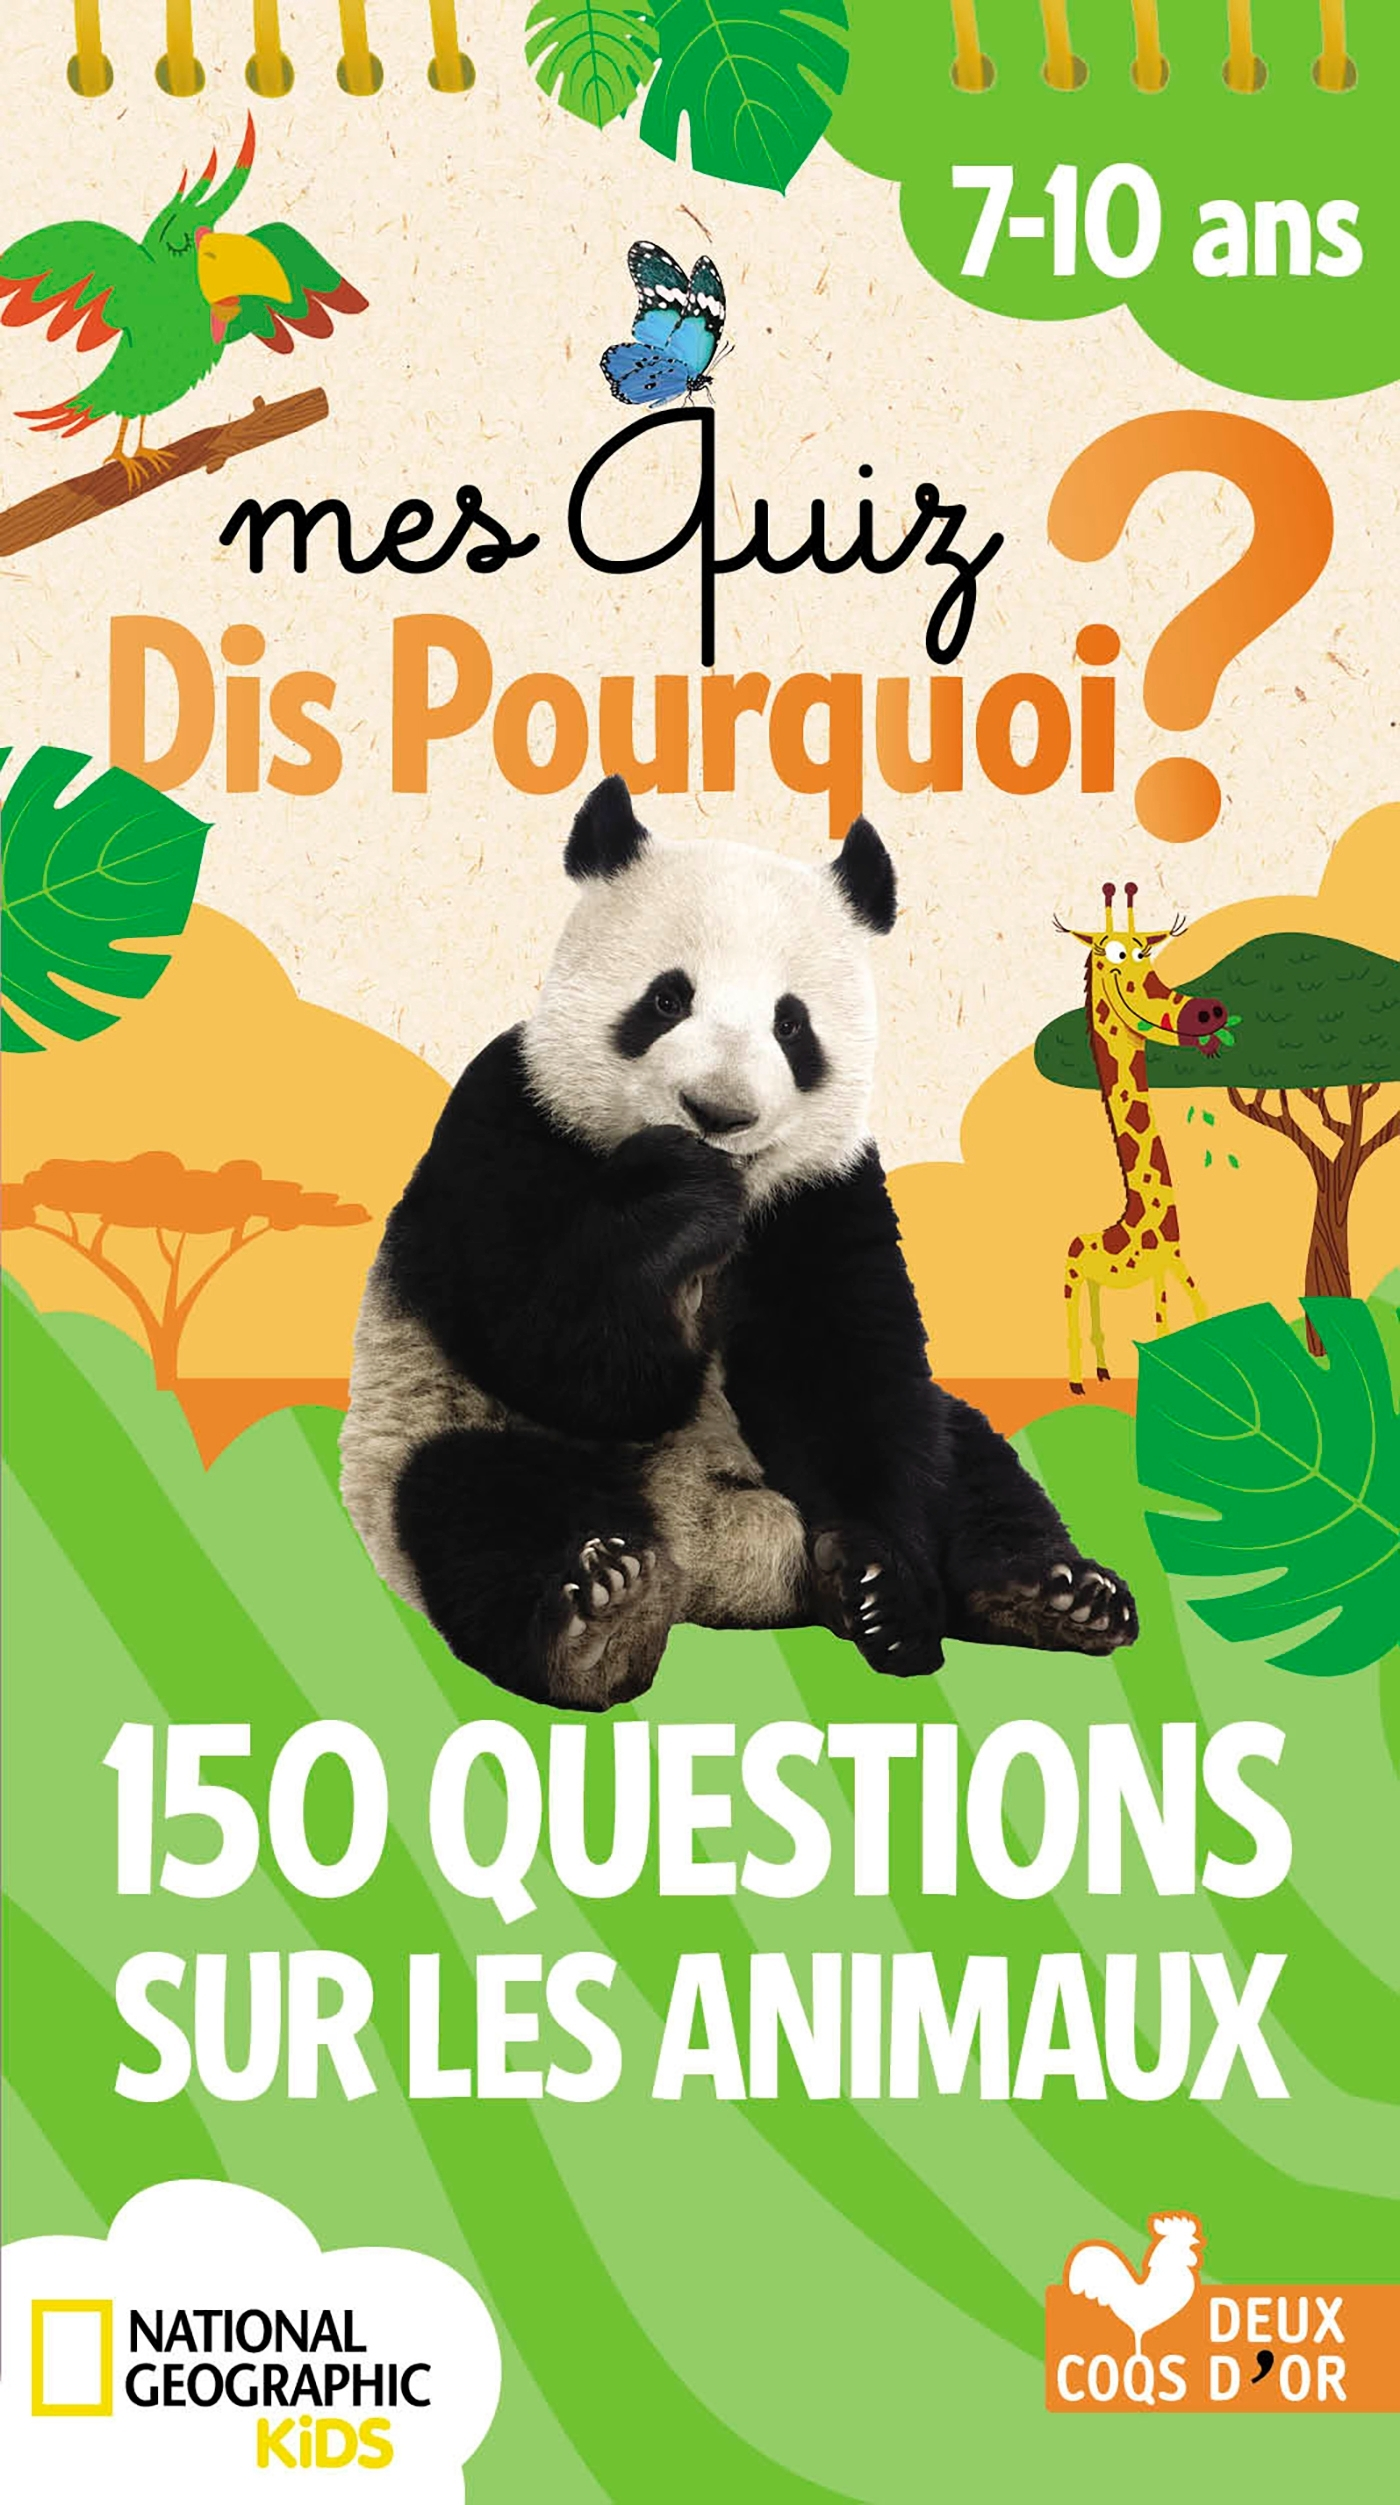 150 QUESTIONS SUR LES ANIMAUX - NATIONAL GEOGRAPHIC